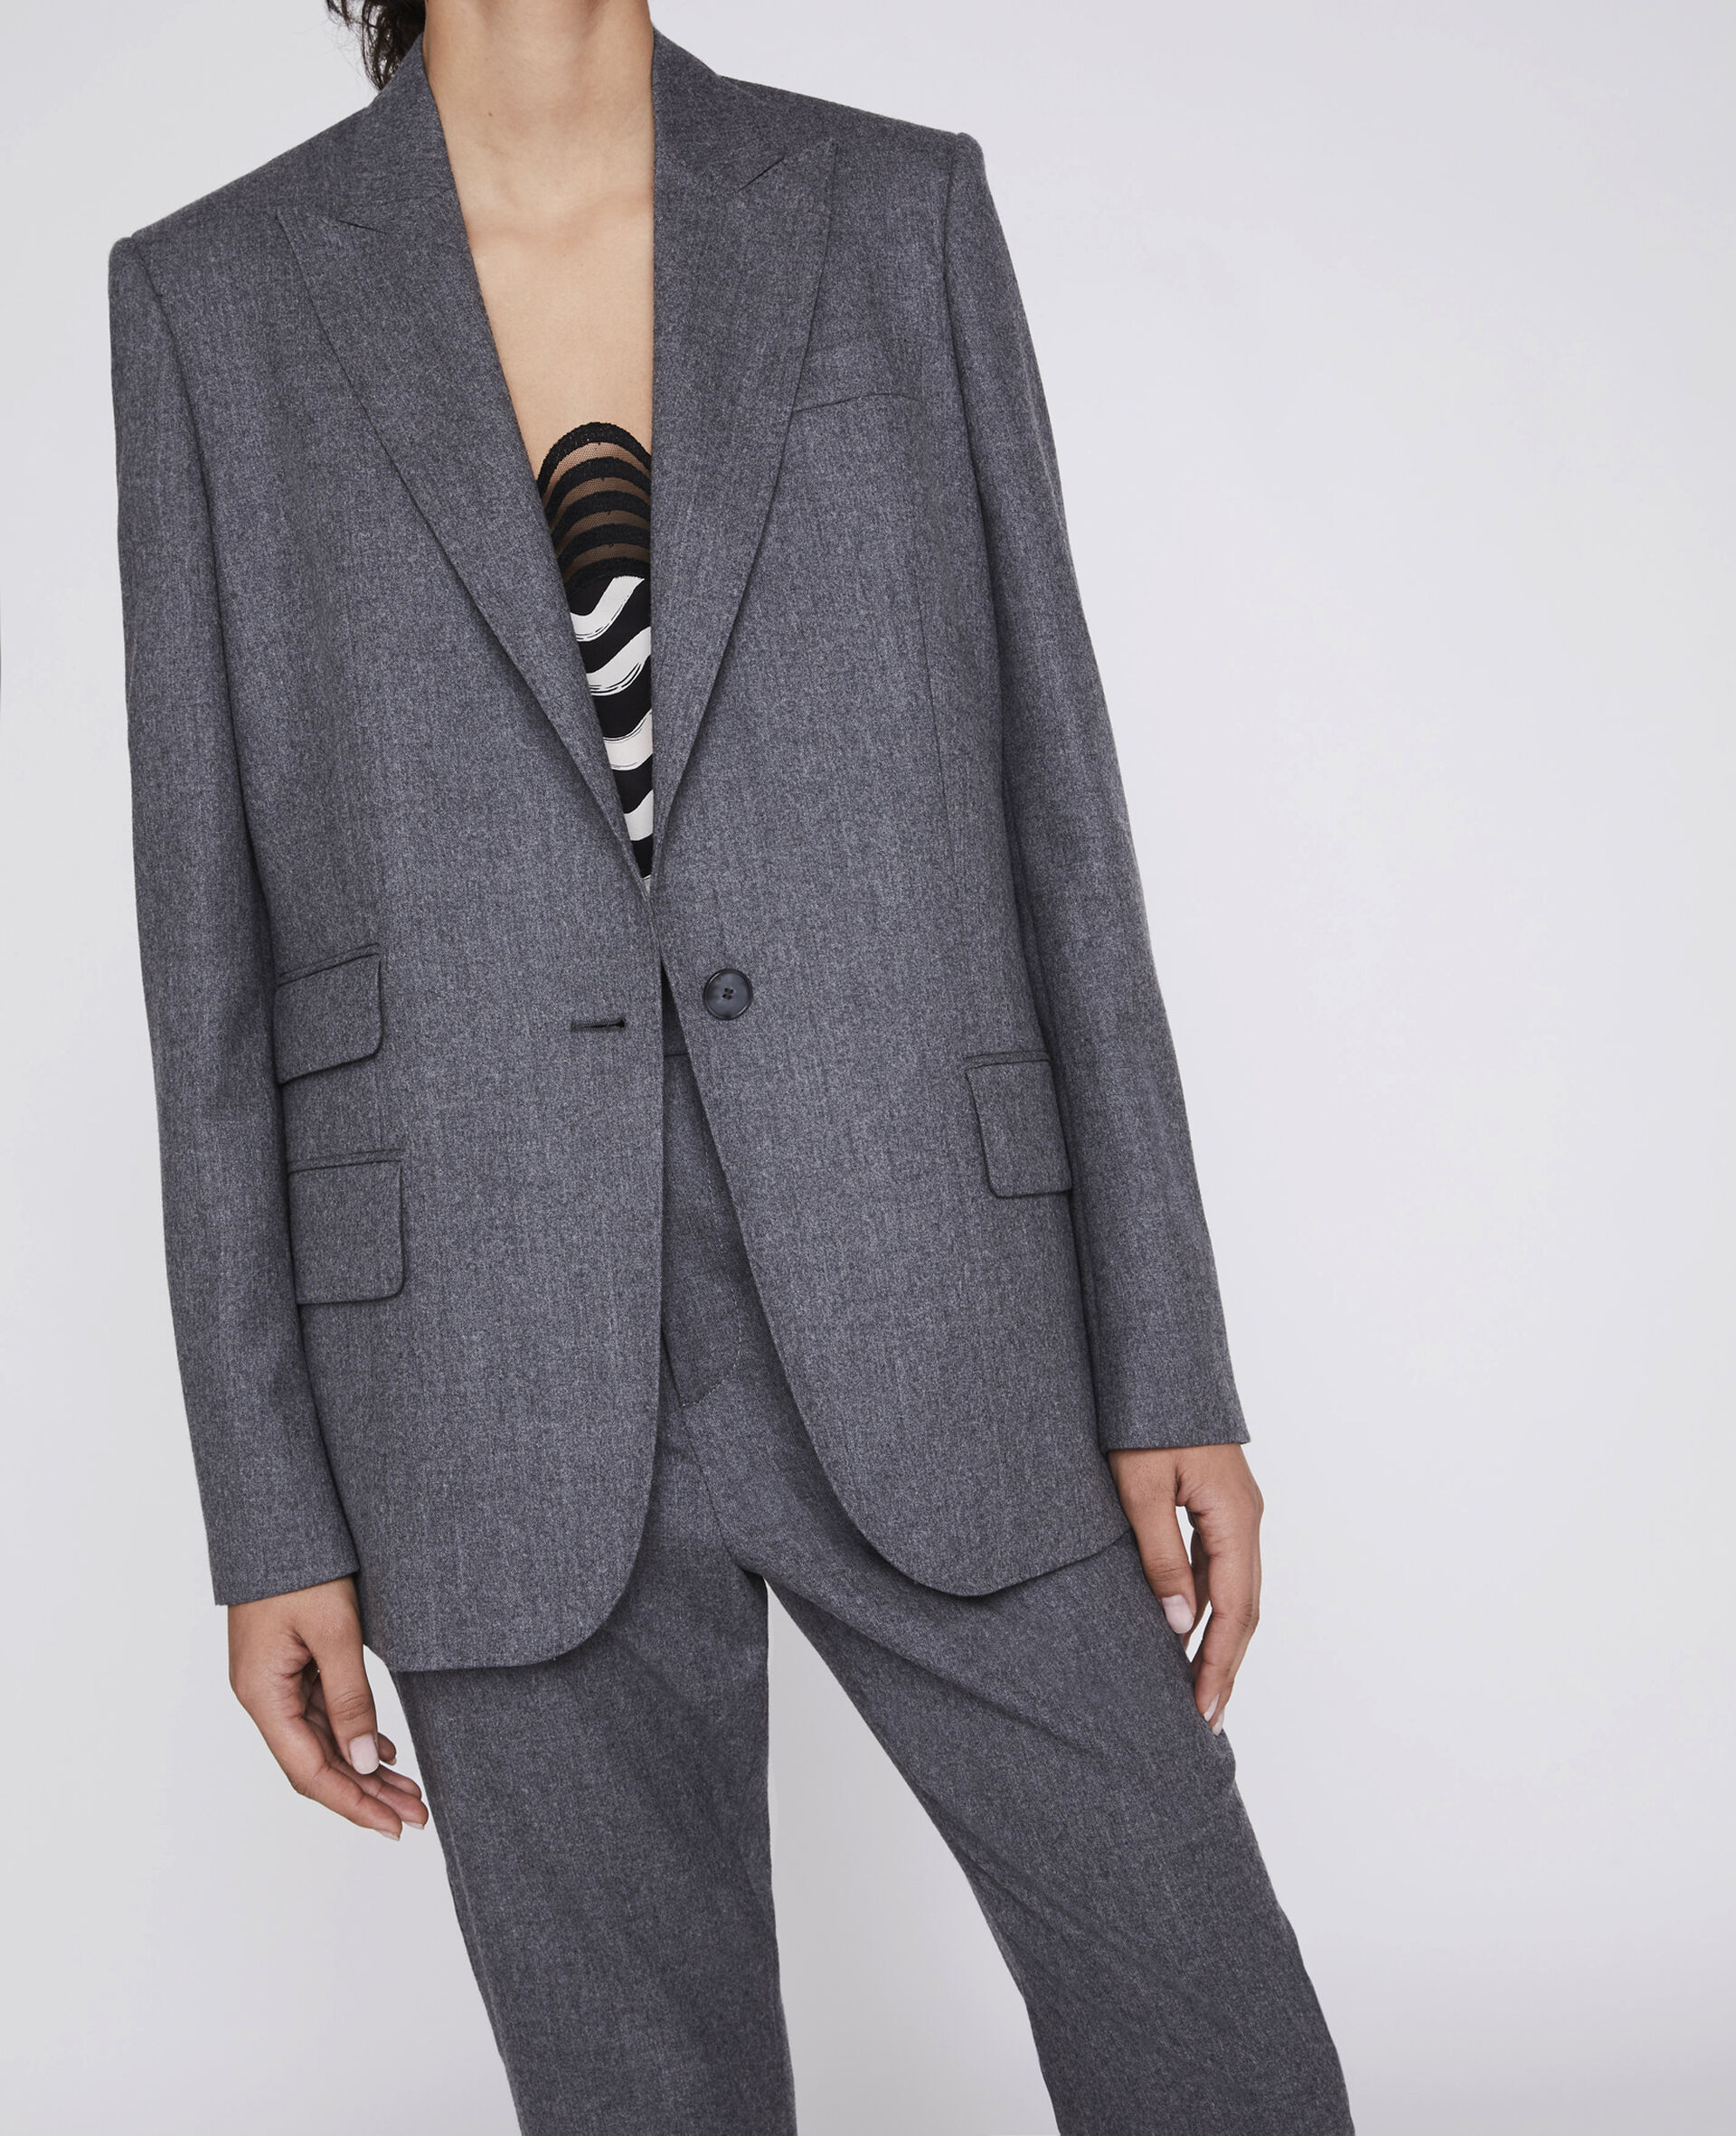 Tailored Bell Jacket -Grau-large image number 3